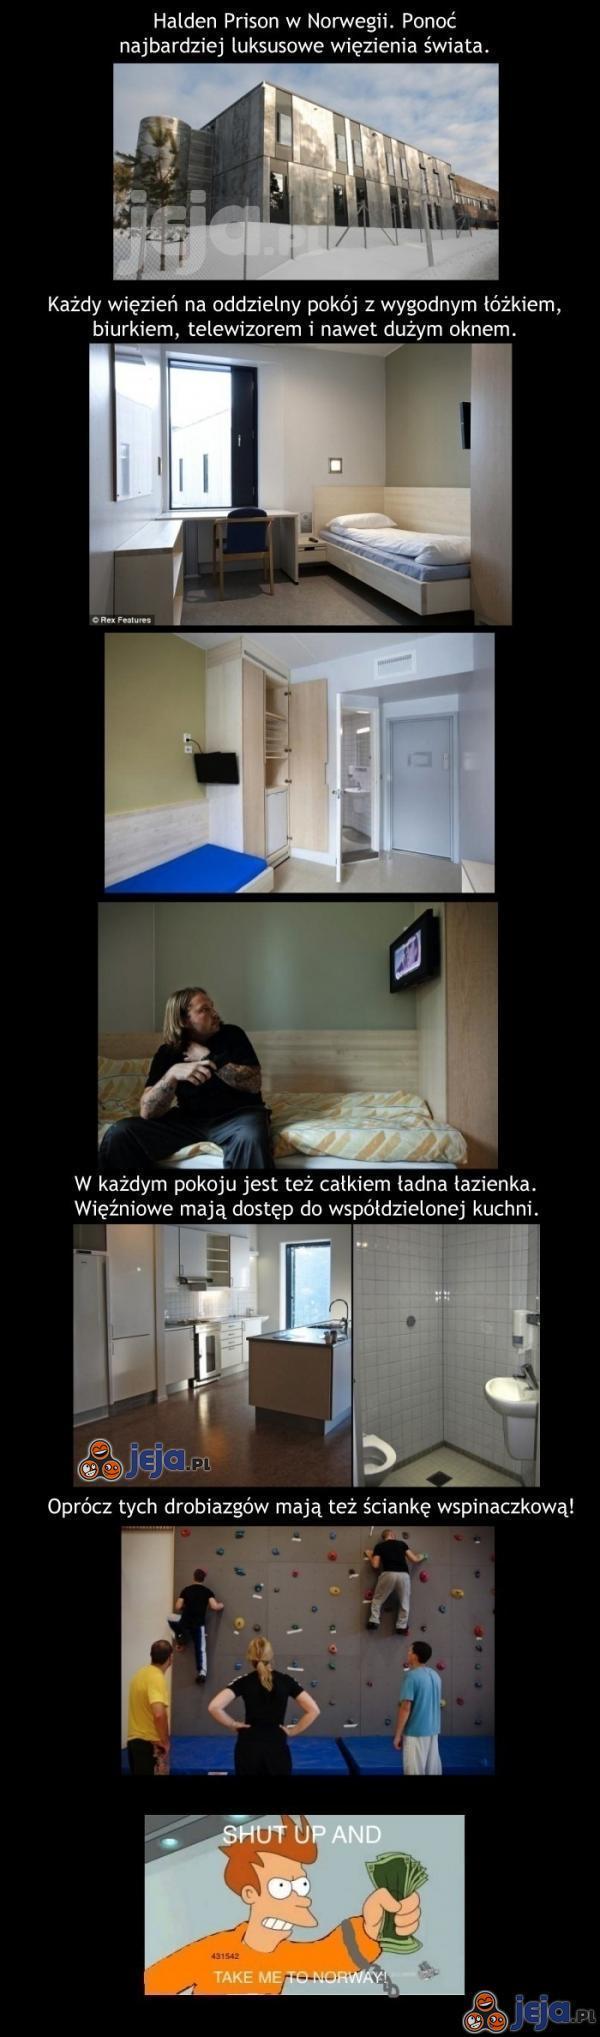 Luksusowe więzienie w Norwegii - Halden Prison